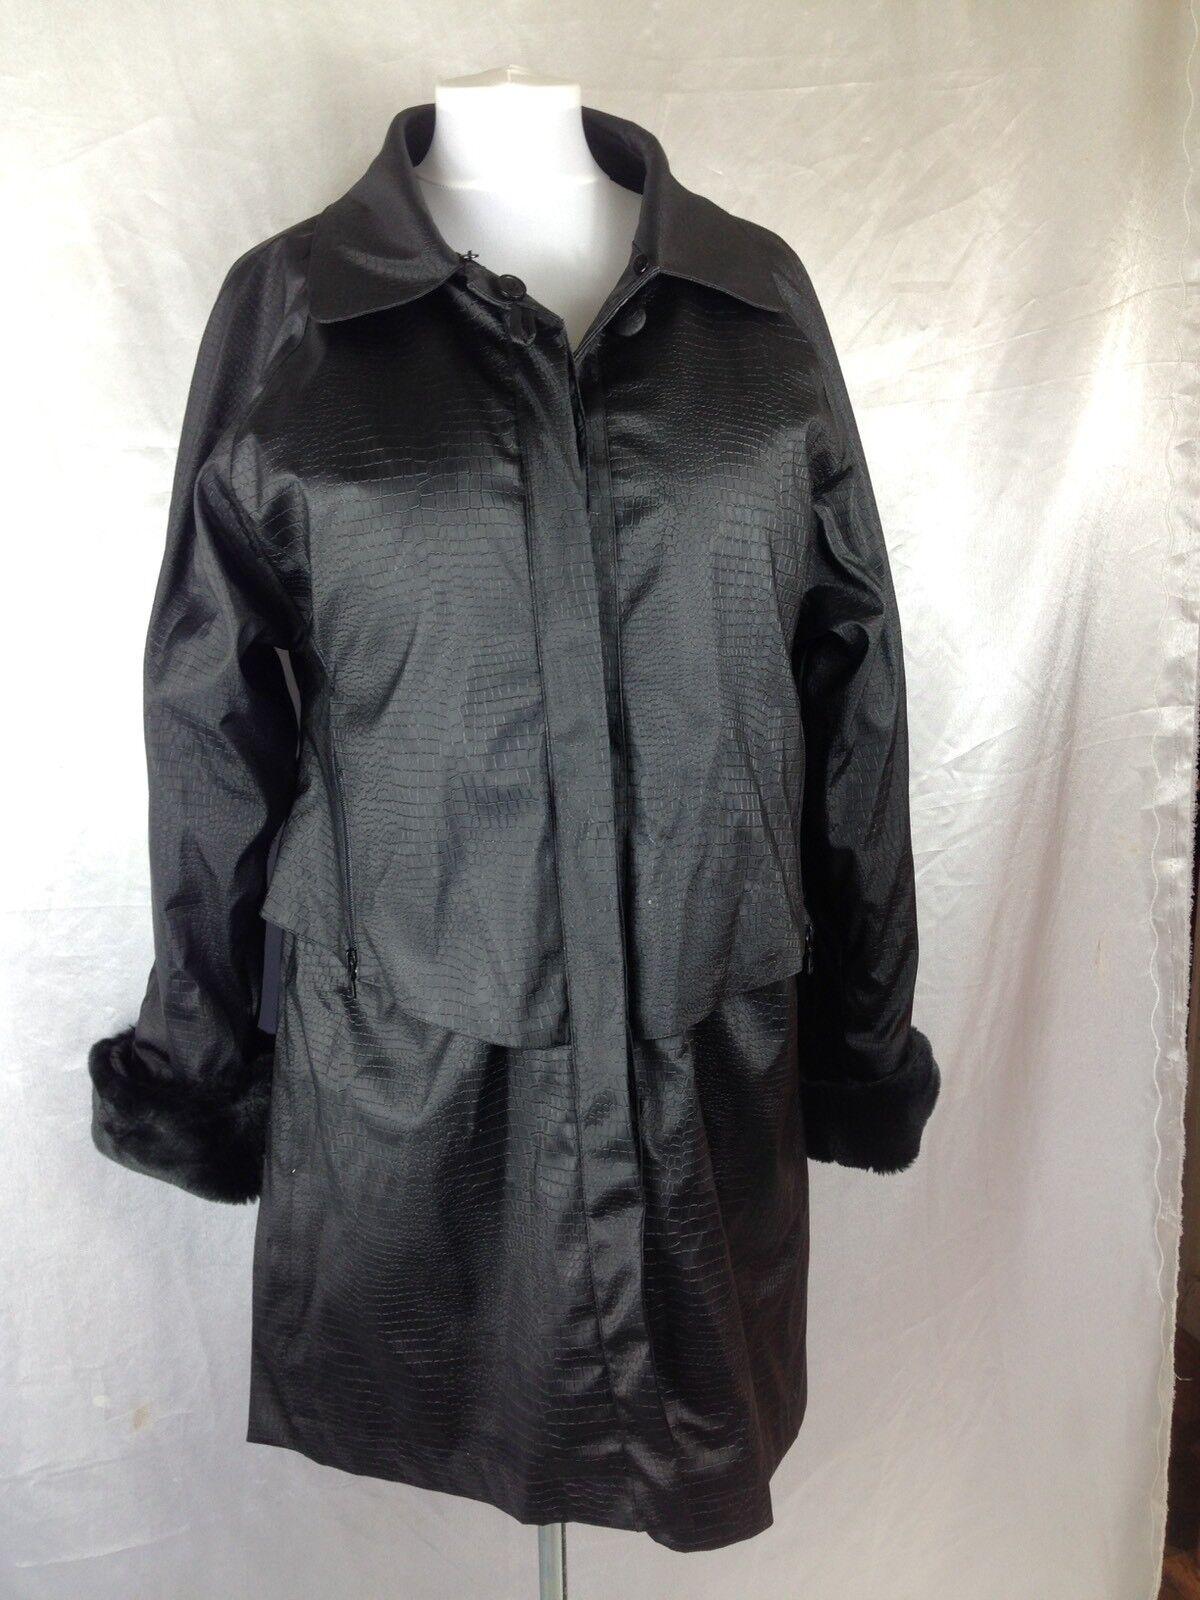 Rubbery Shiny PU Rustling Noisy Raincoat Mac Mistress Sissy 40 Chest Macintosh